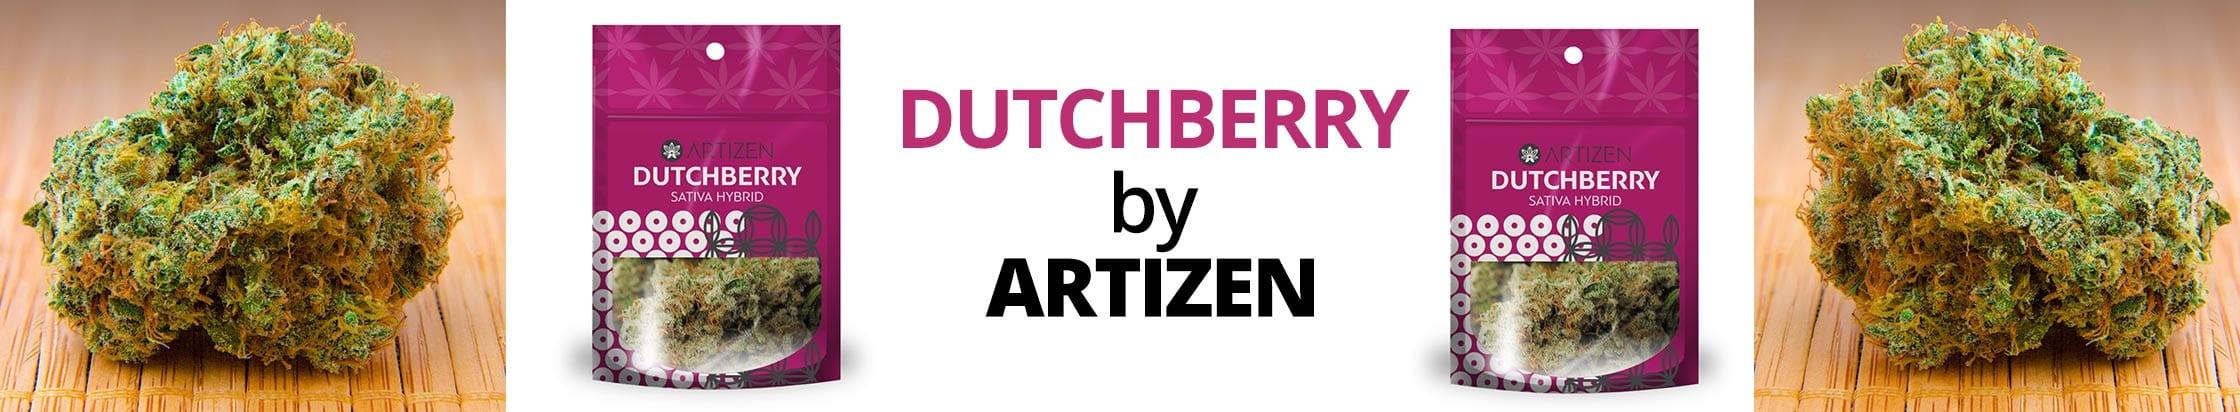 artizen-dutchberry-slice